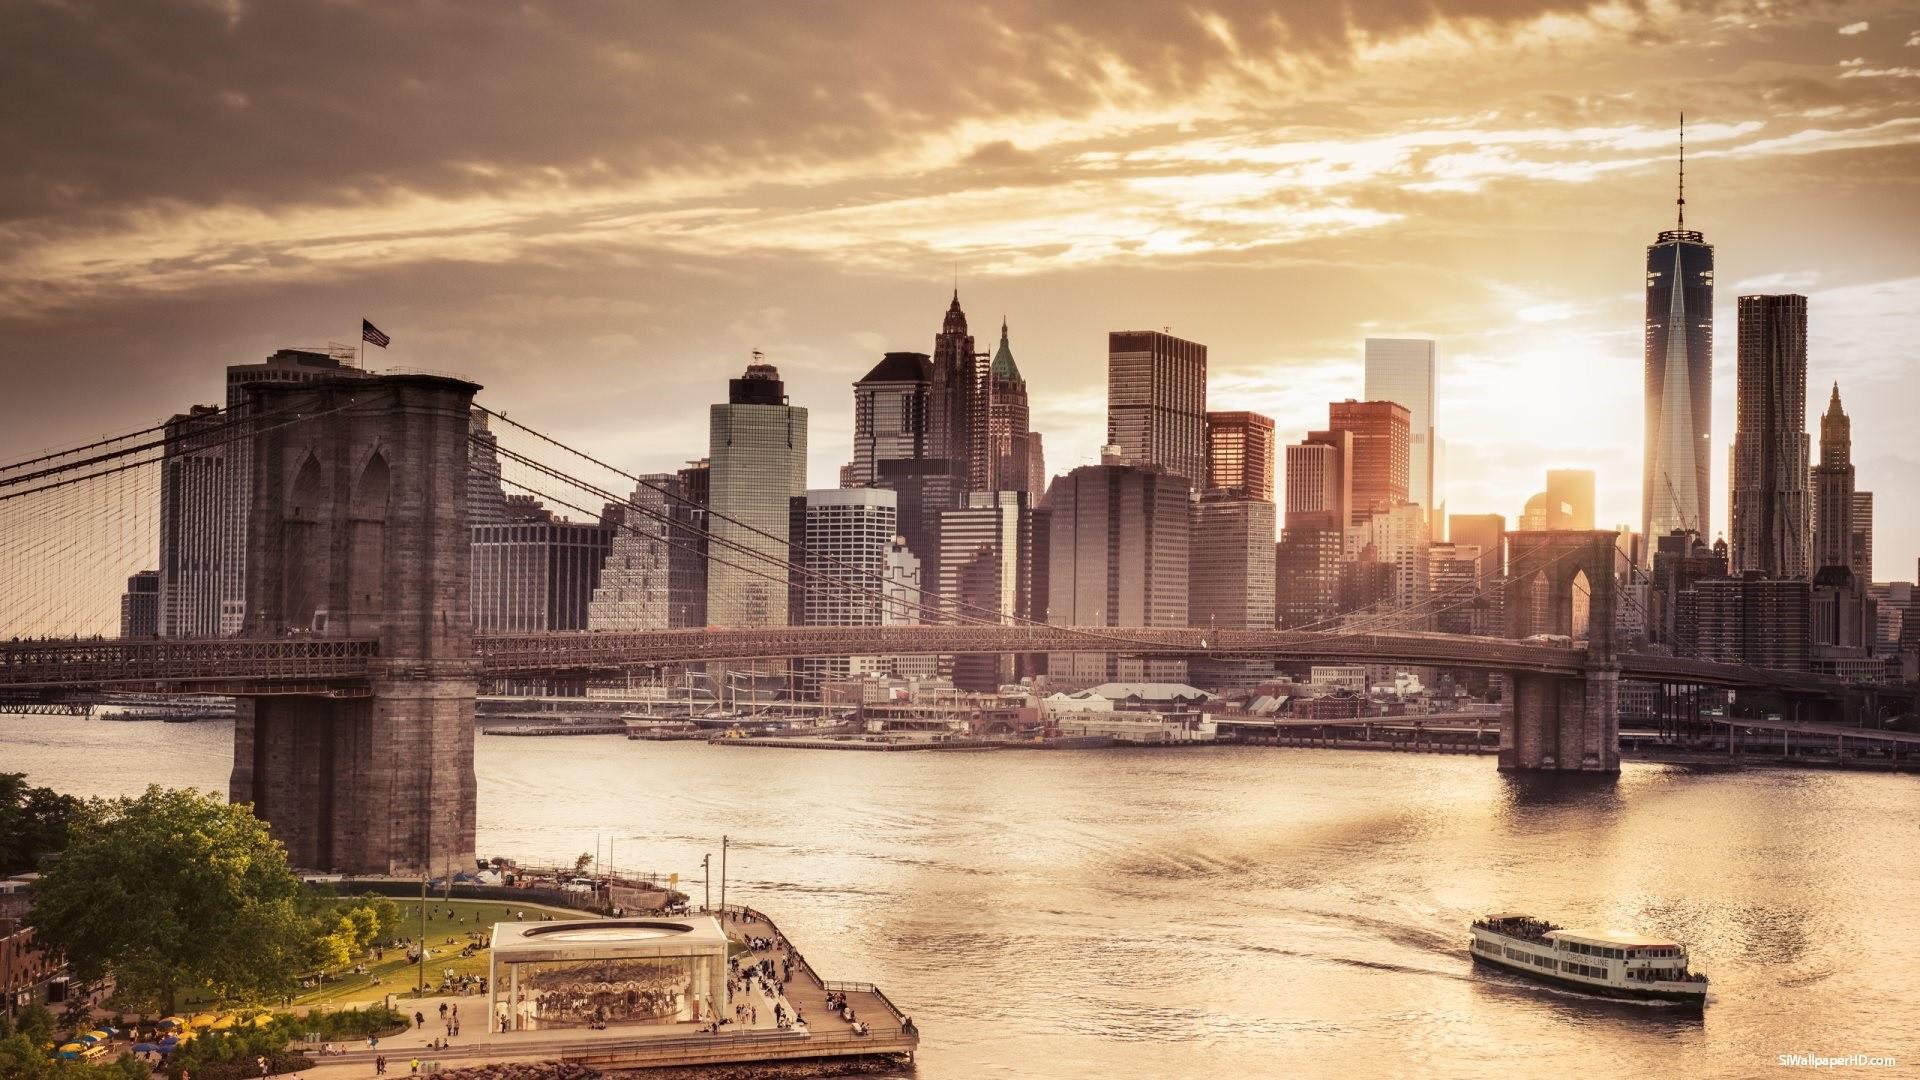 New York Skyline Wallpapers Desktop Background : City Wallpaper 1920×1200 New  York Skyline Wallpaper